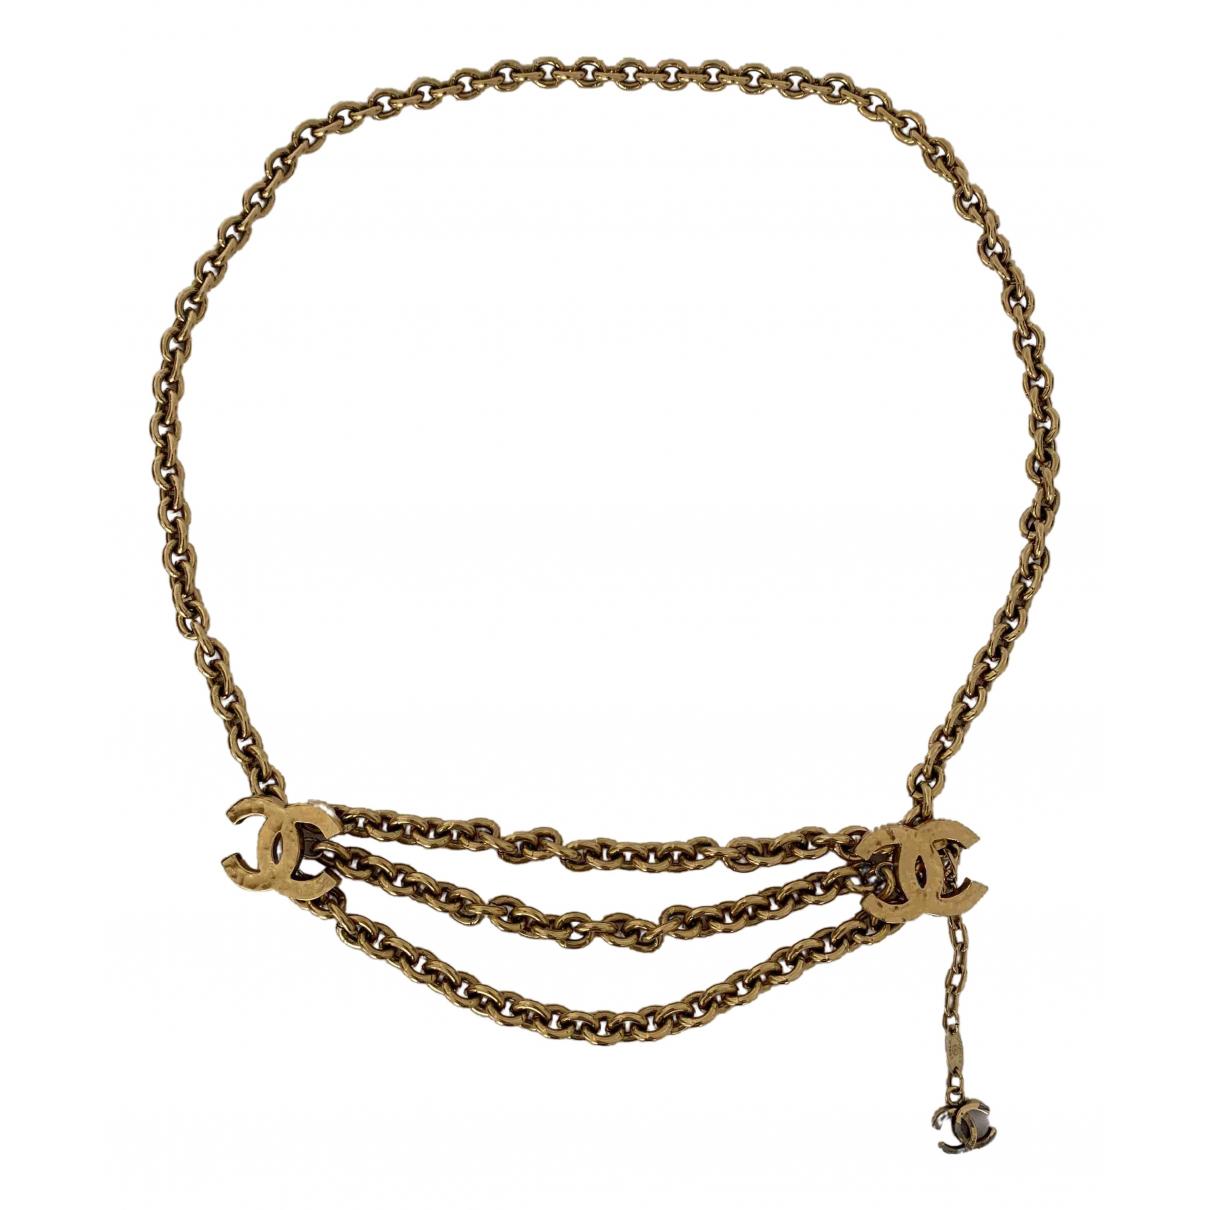 Chanel \N Gold Chain belt for Women 80 cm